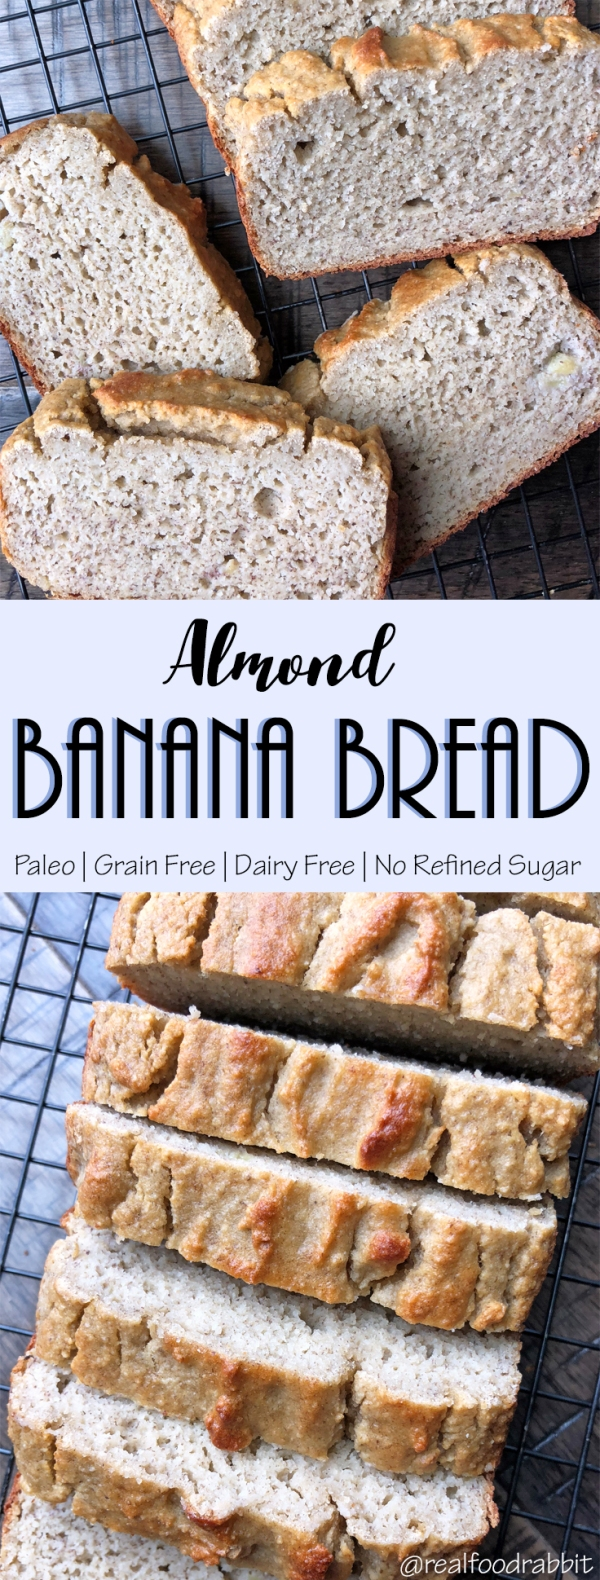 Almond Banana Bread.jpg